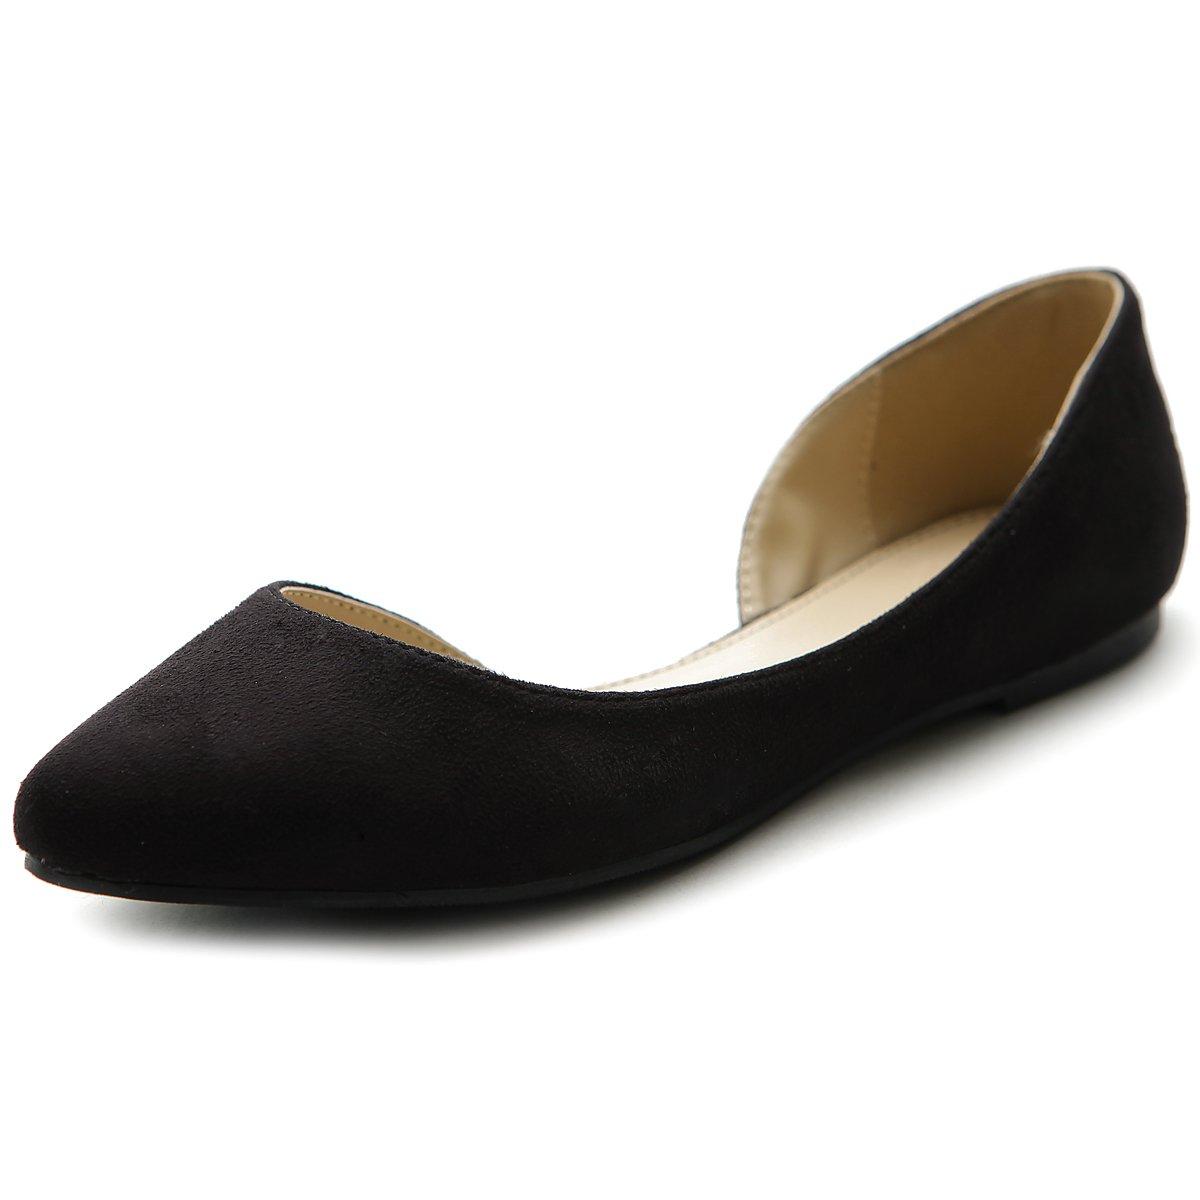 Ollio Women's D'orsay Shoe Comfort Faux suede Pointed Toe Ballet Flat B00P1MJ5GW 7 B(M) US|Black